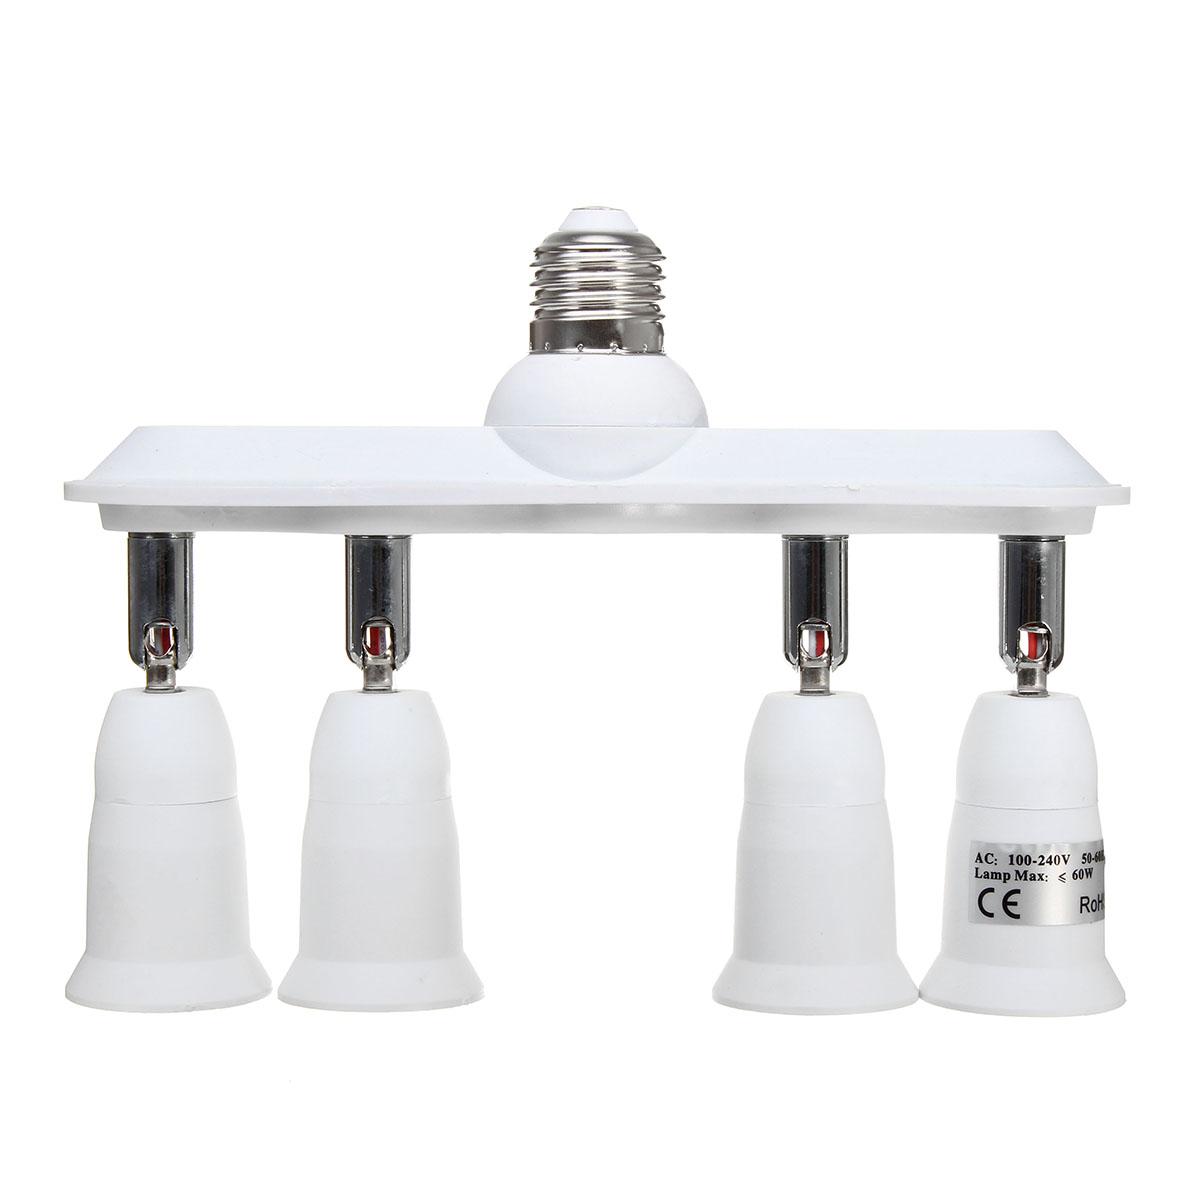 360 Degree Adjustable E27 to 4 E27 Light Bulb Socket Ad